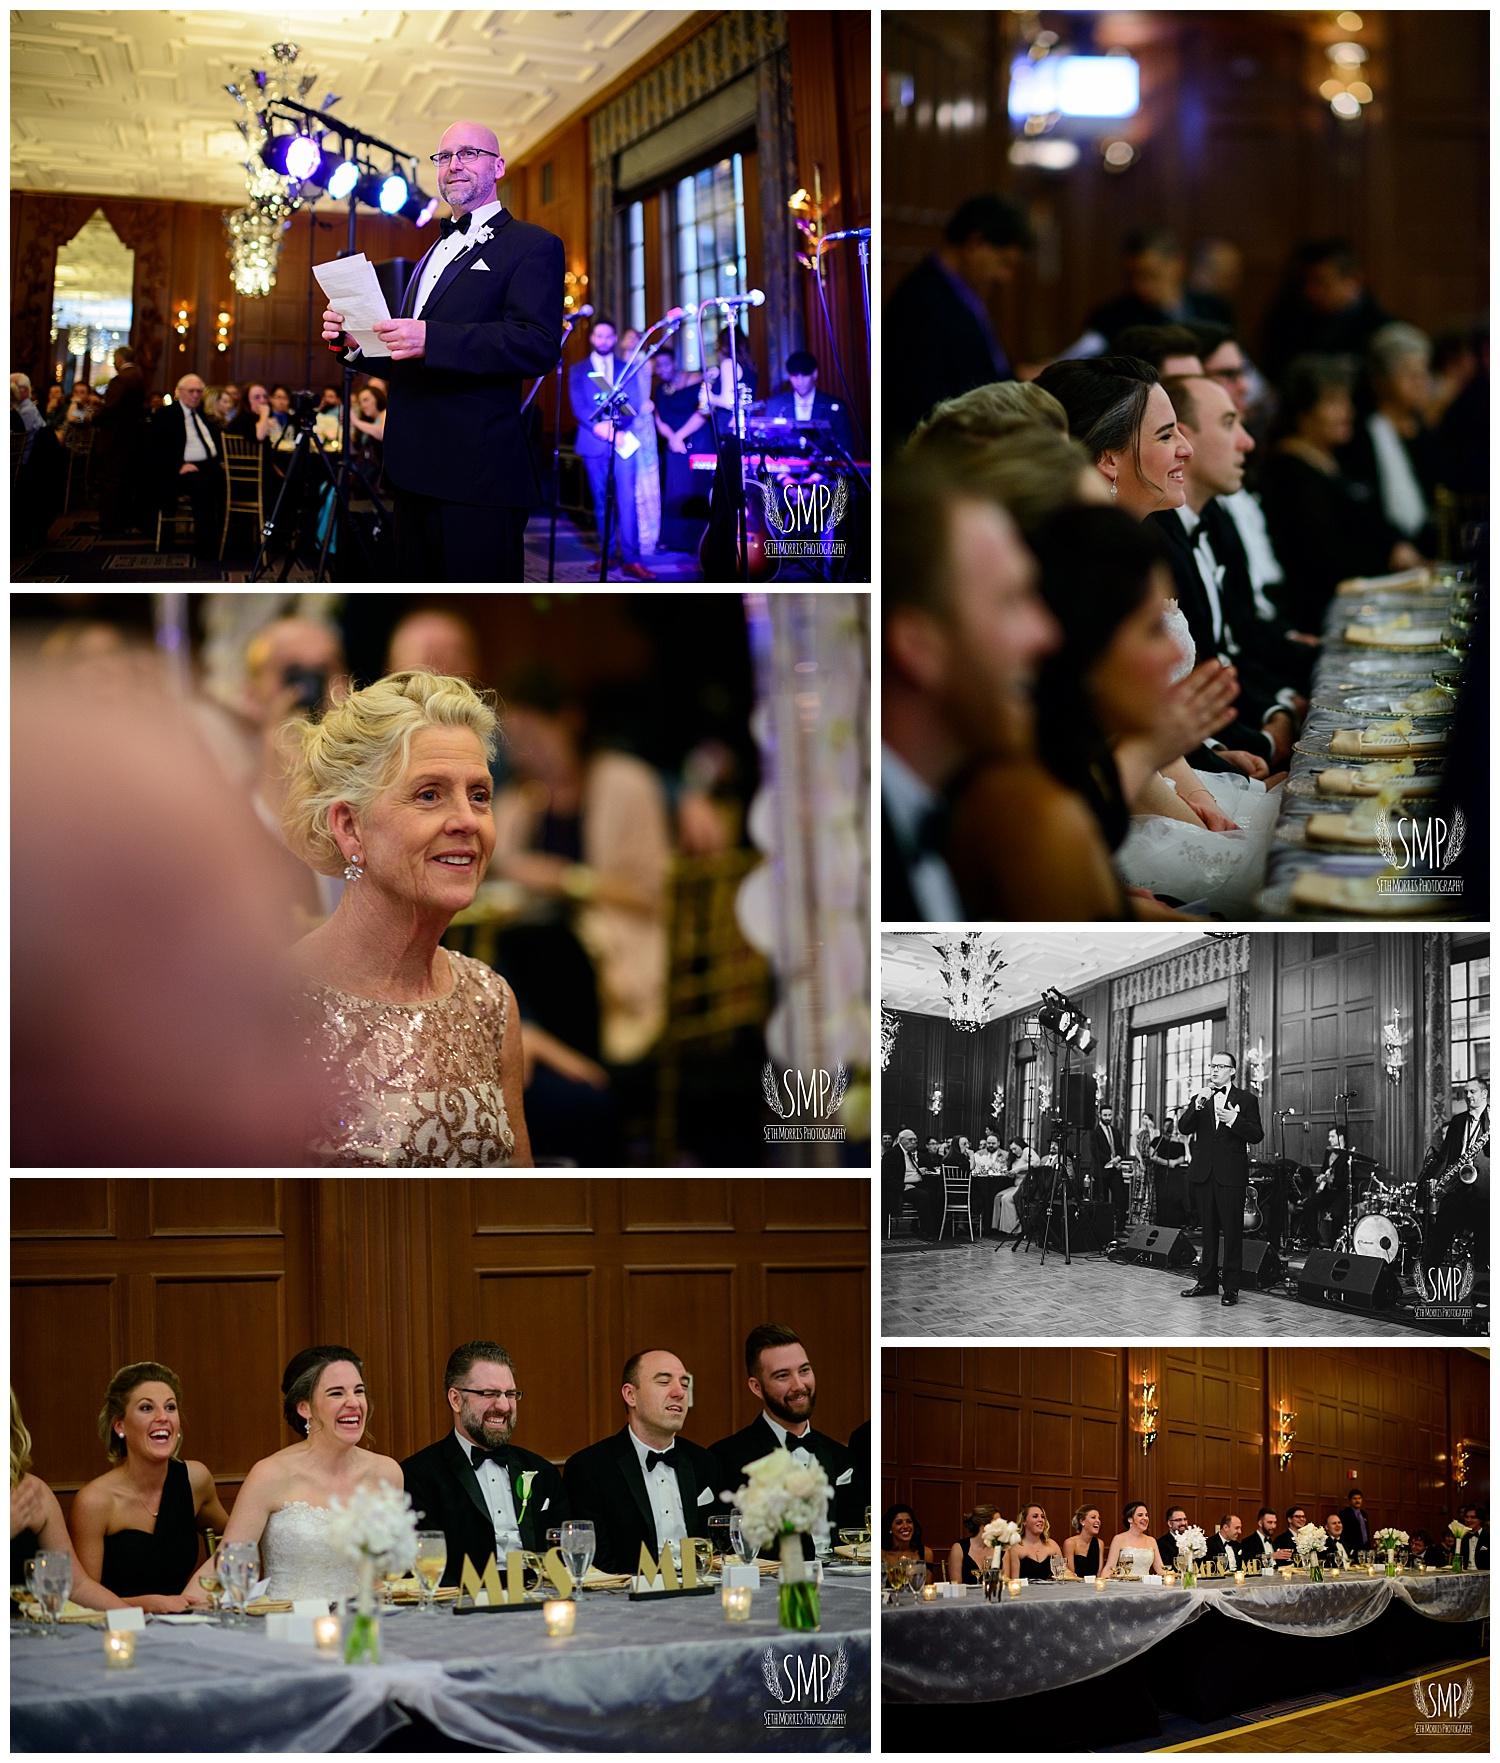 chicago-wedding-pictures-del-strada-hotel-allegro-100.jpg